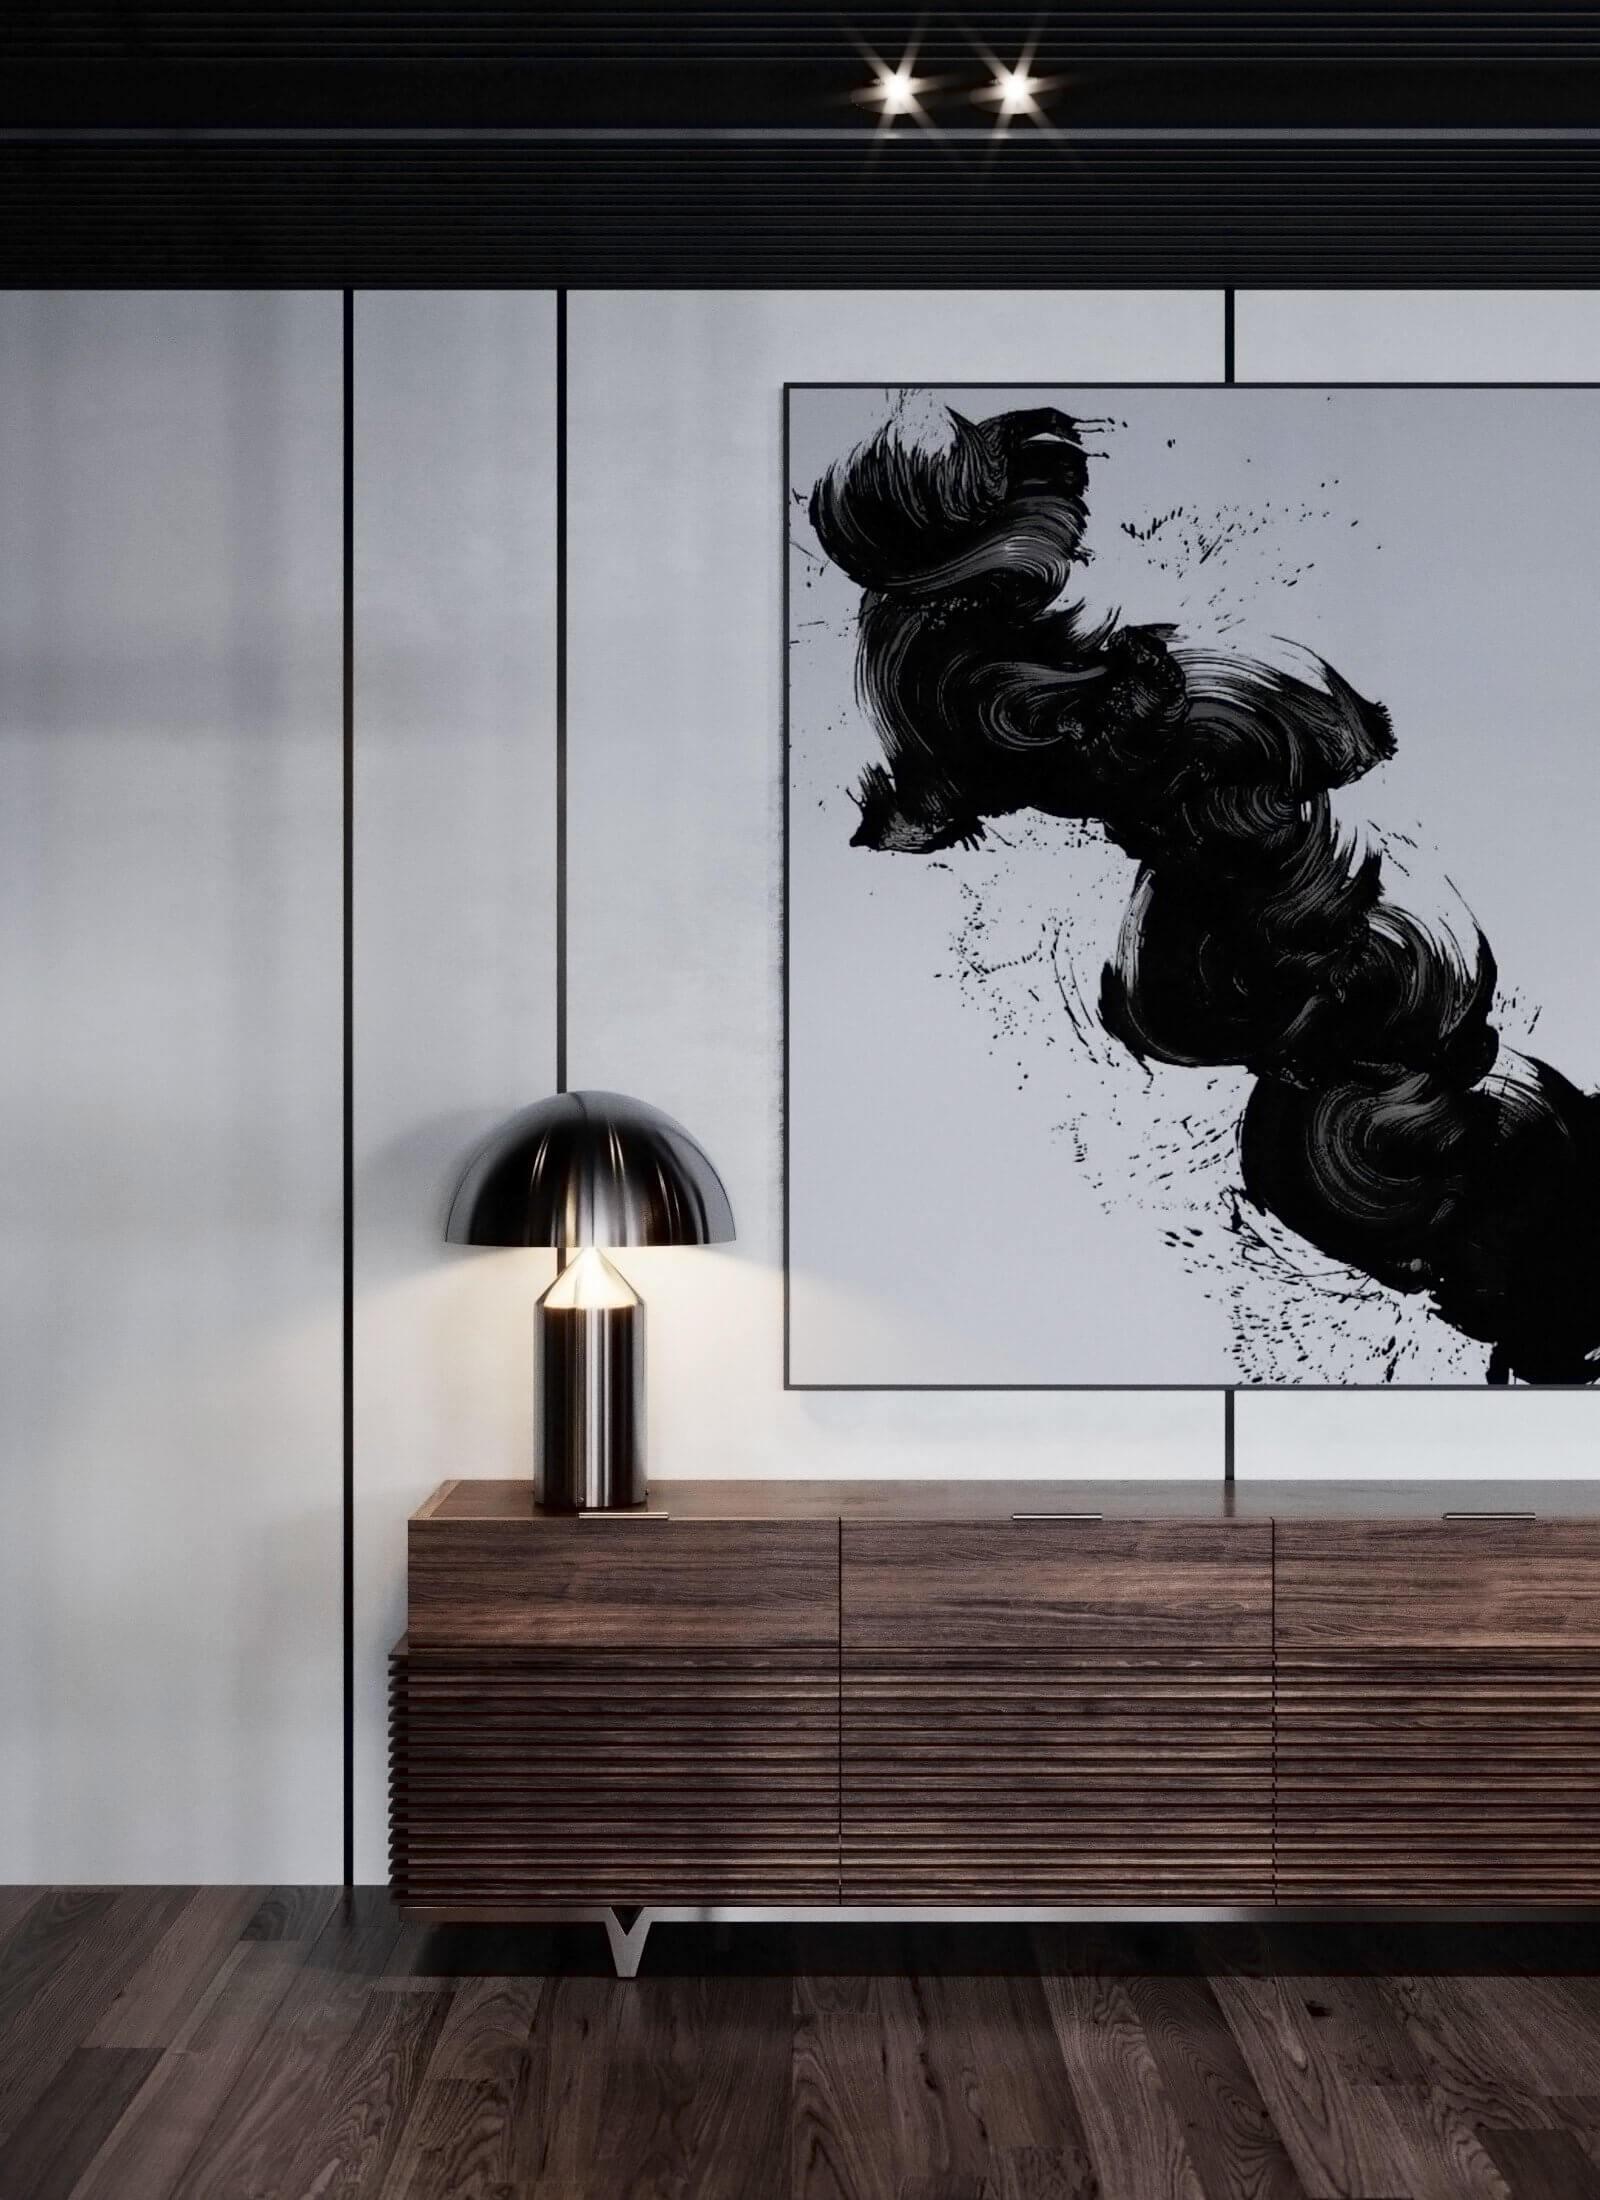 Dubrovka apartment sideboard - cgi visualizatiomn